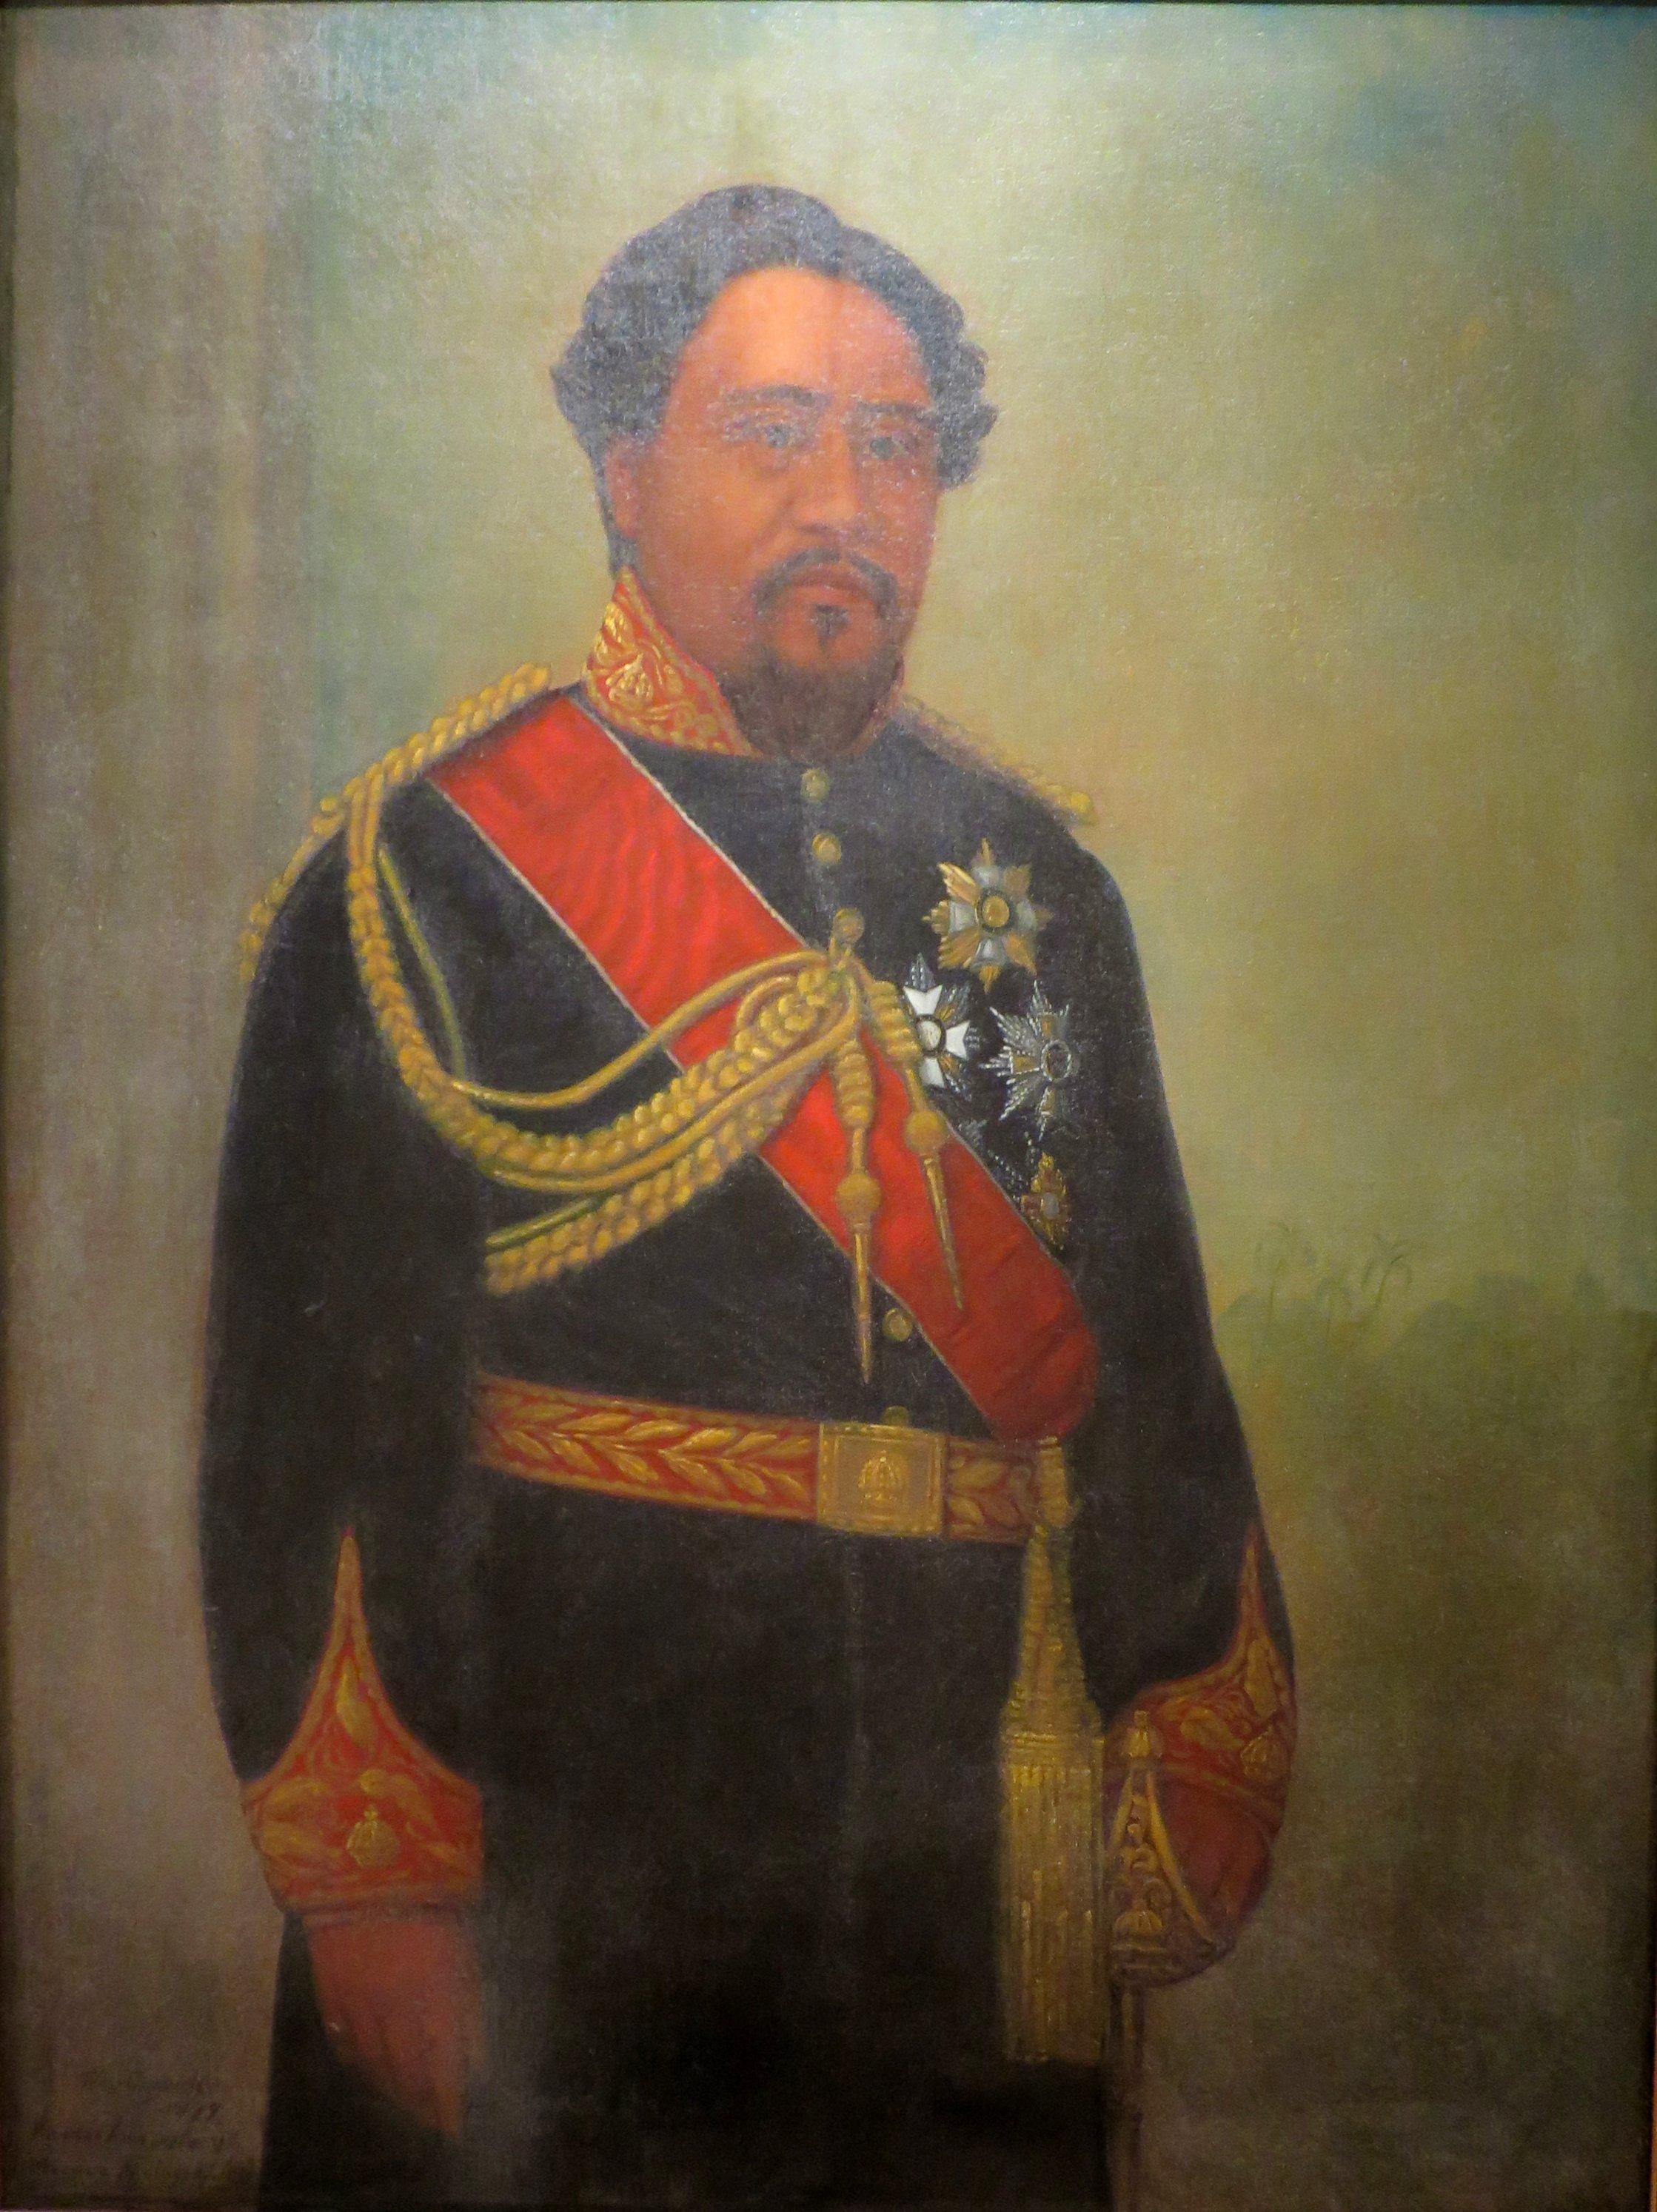 Casa Real de Hawaii Kamehamehav